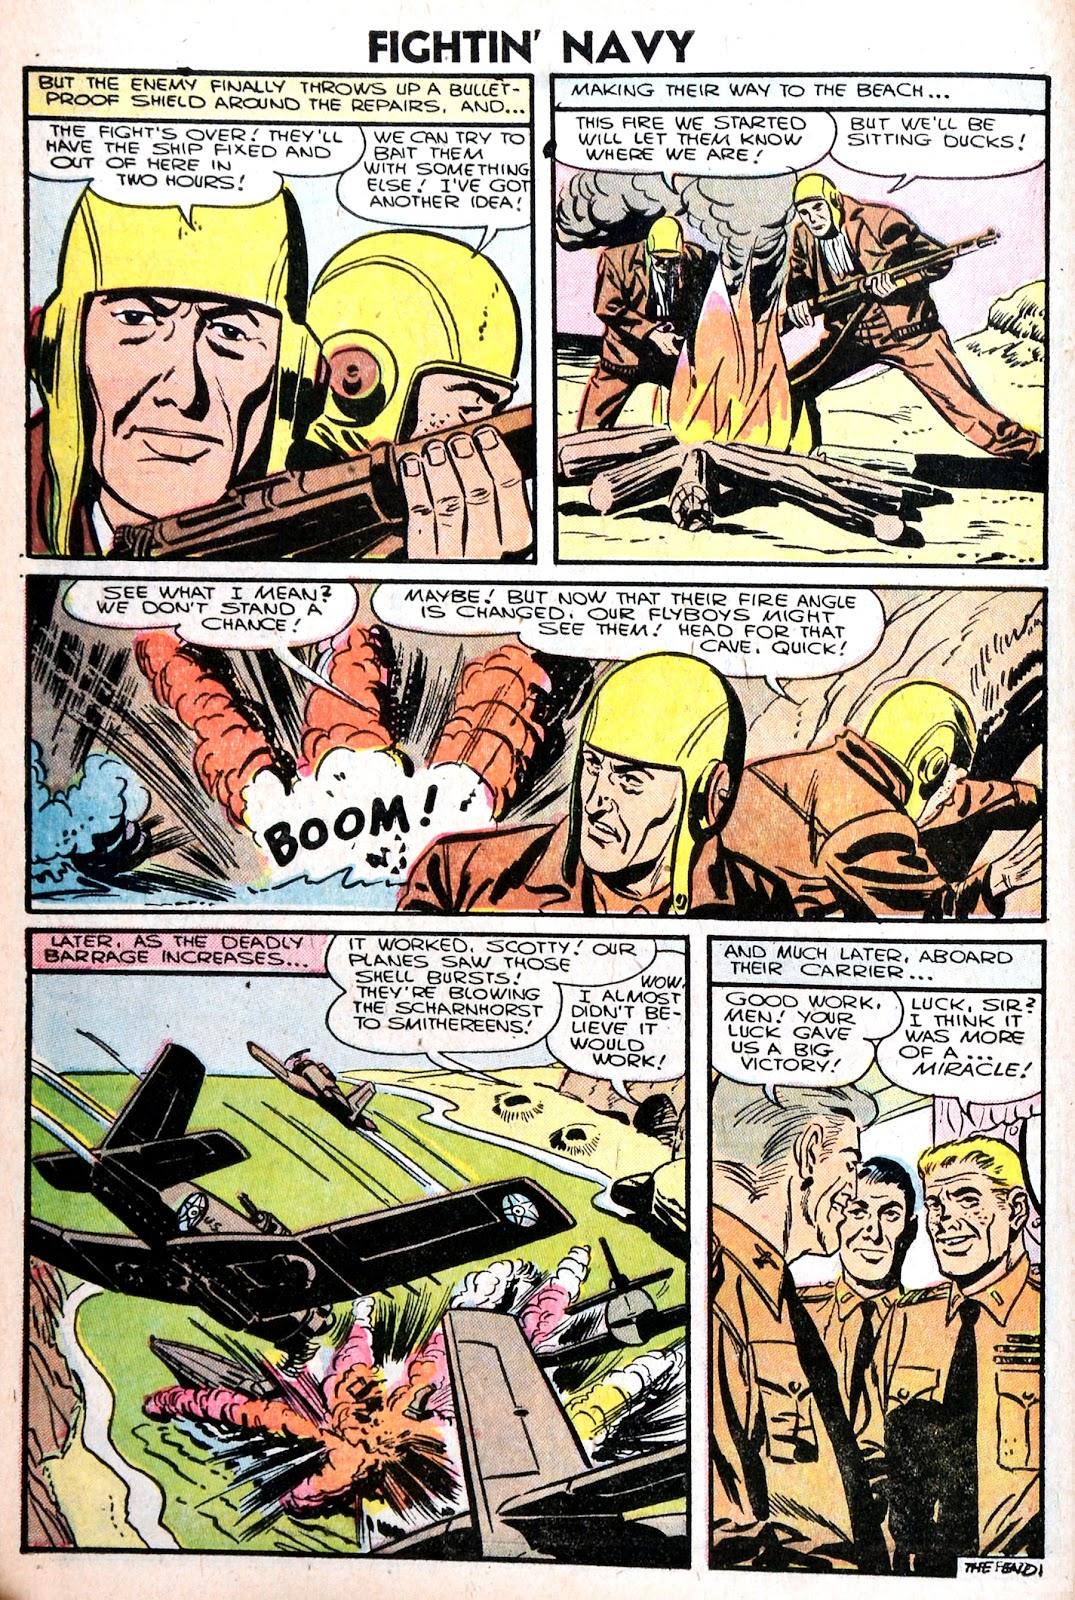 Read online Fightin' Navy comic -  Issue #75 - 10